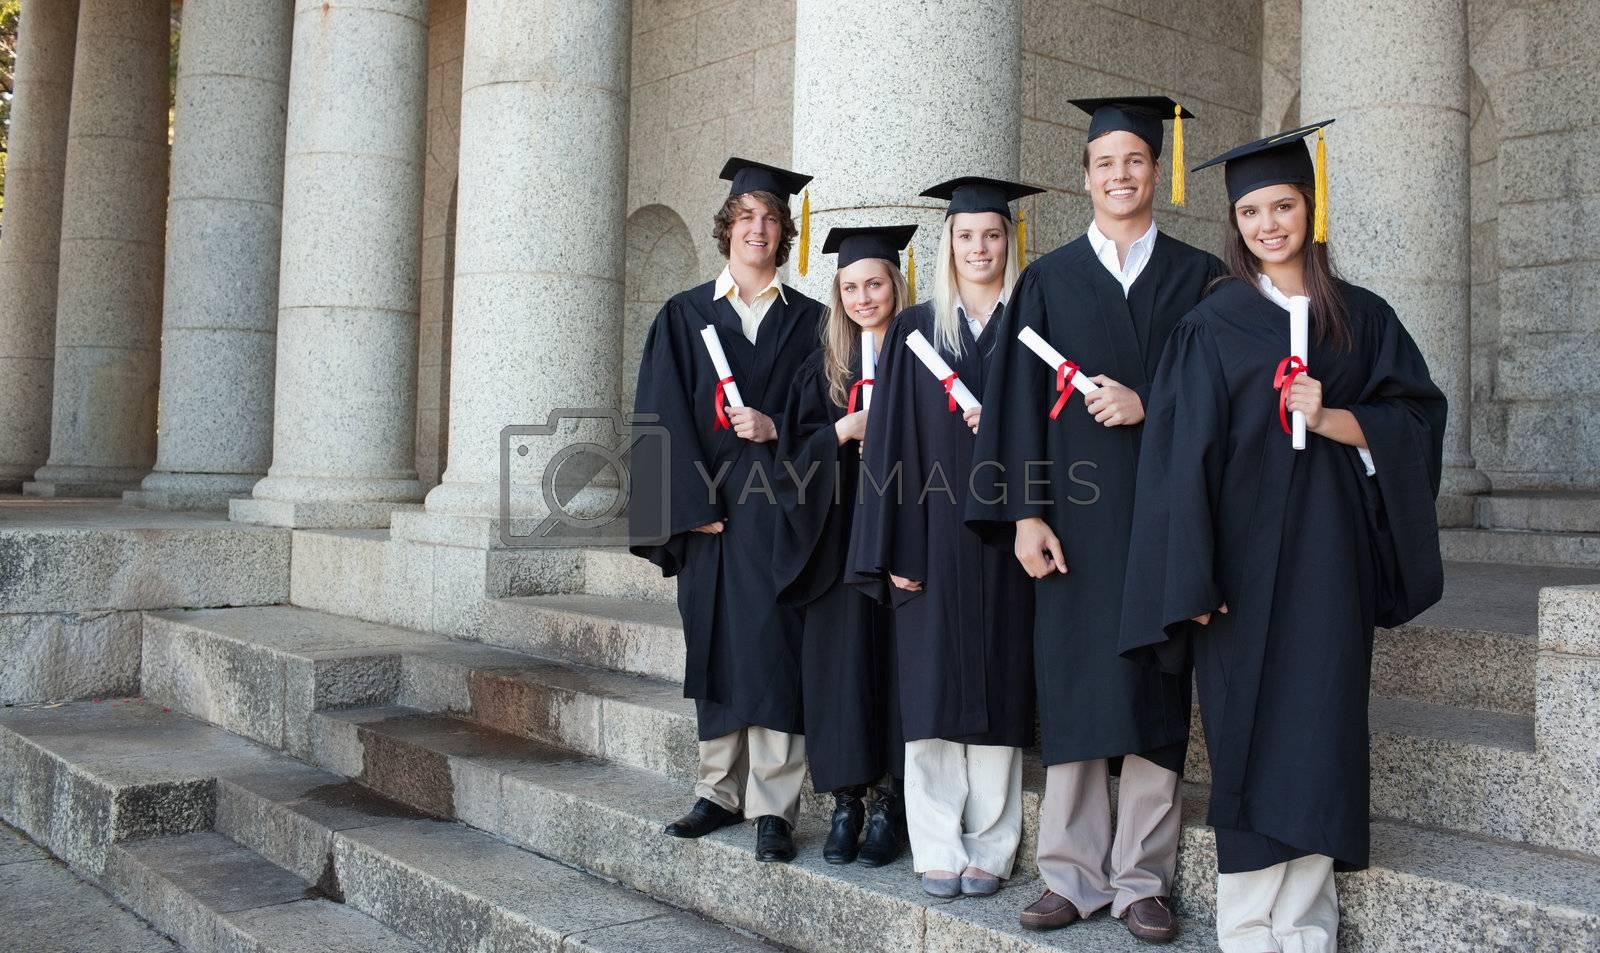 Five happy graduates posing in front of the university